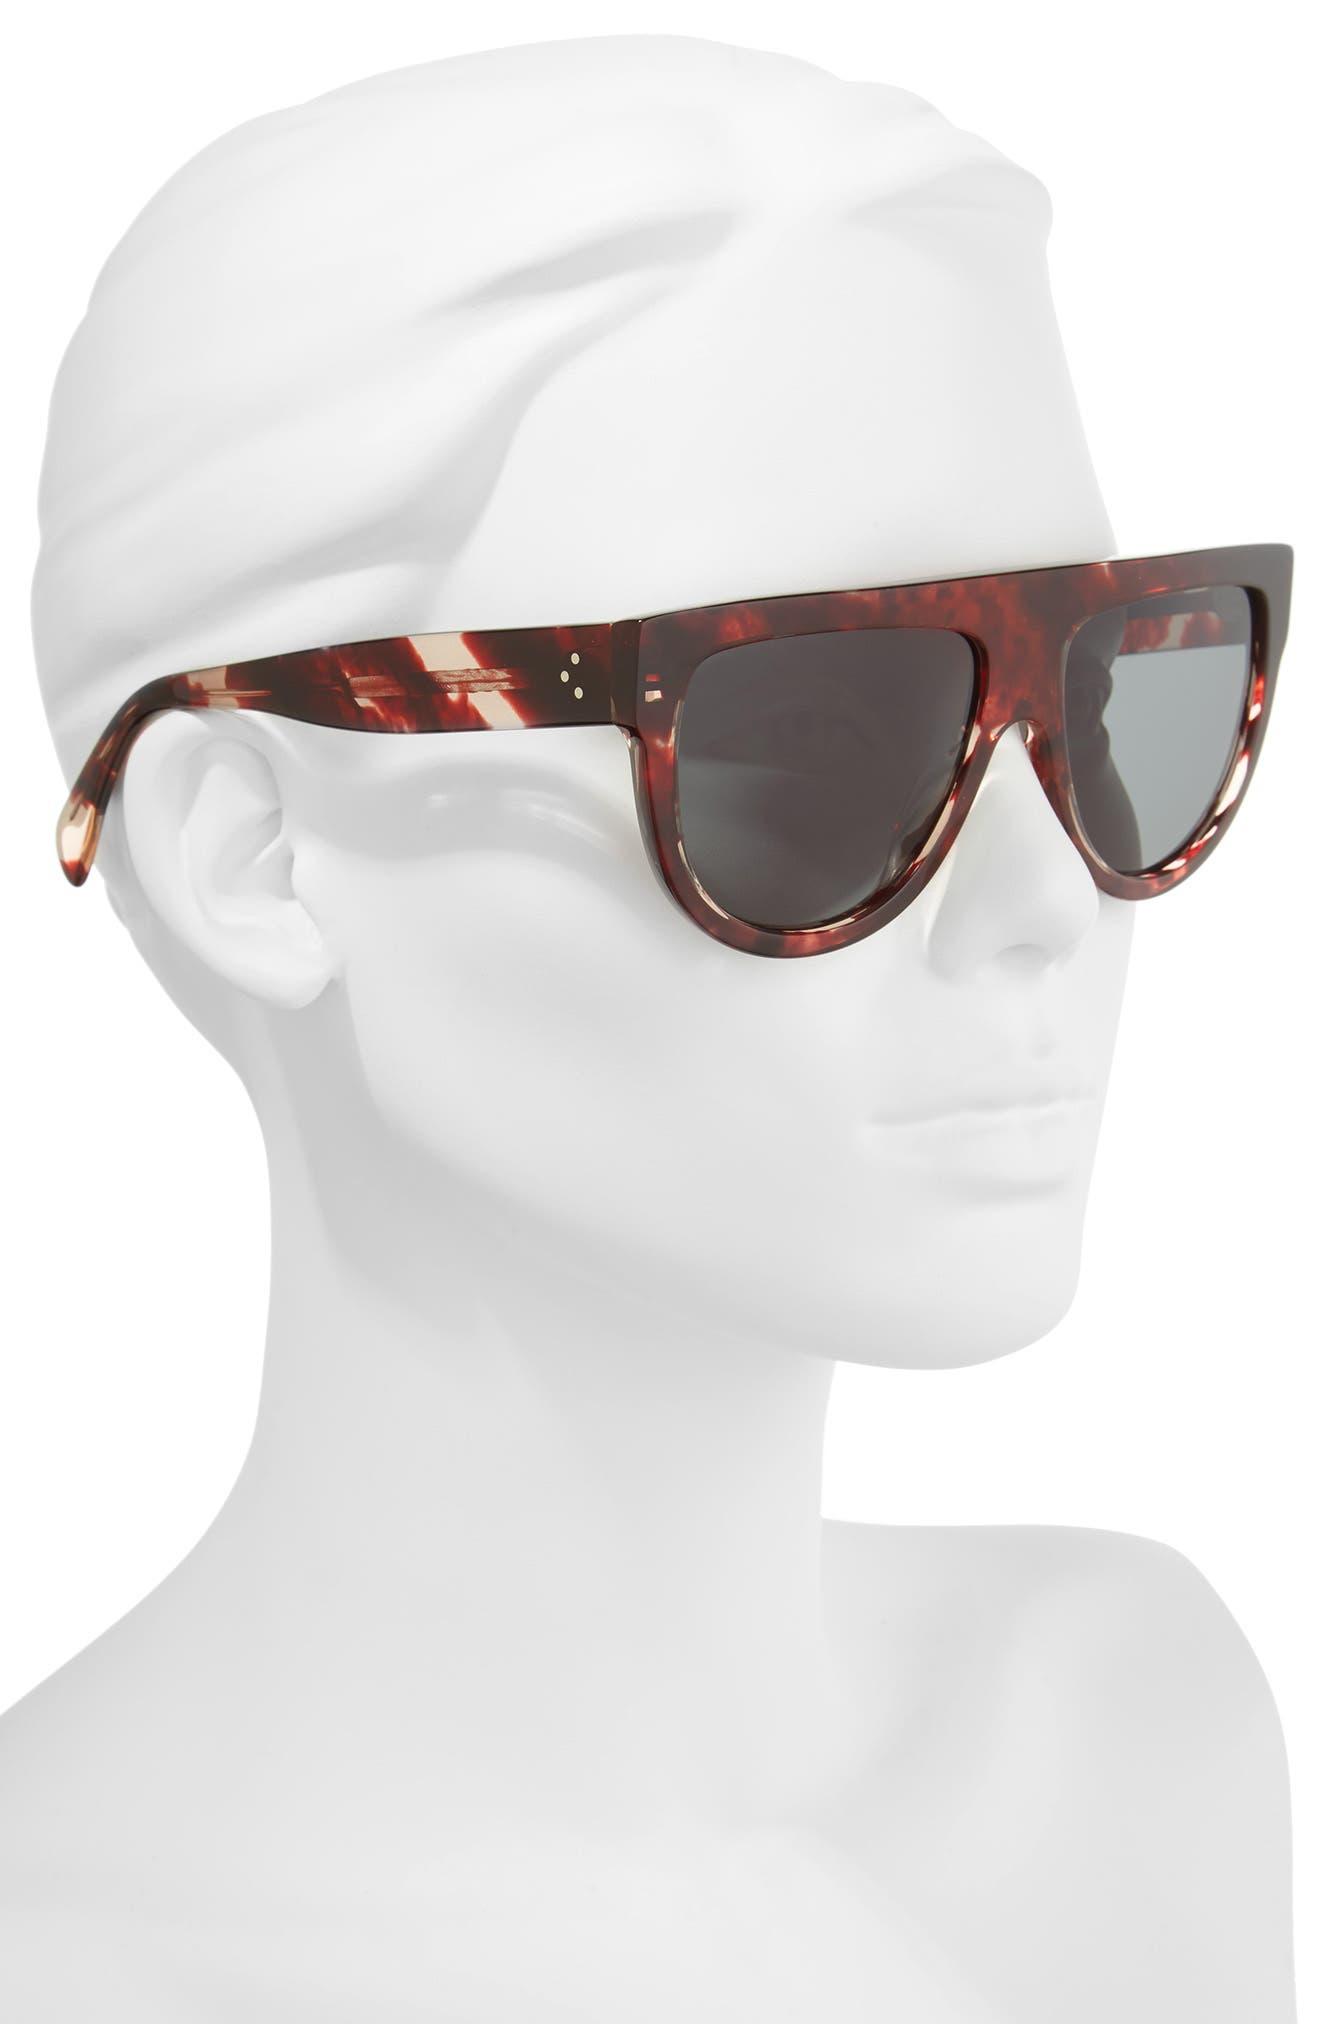 7c4379bf29 C line 50mm Square Sunglasses Source · Shop Celine Flat Top Sunglasses  Striped Red Havana Green